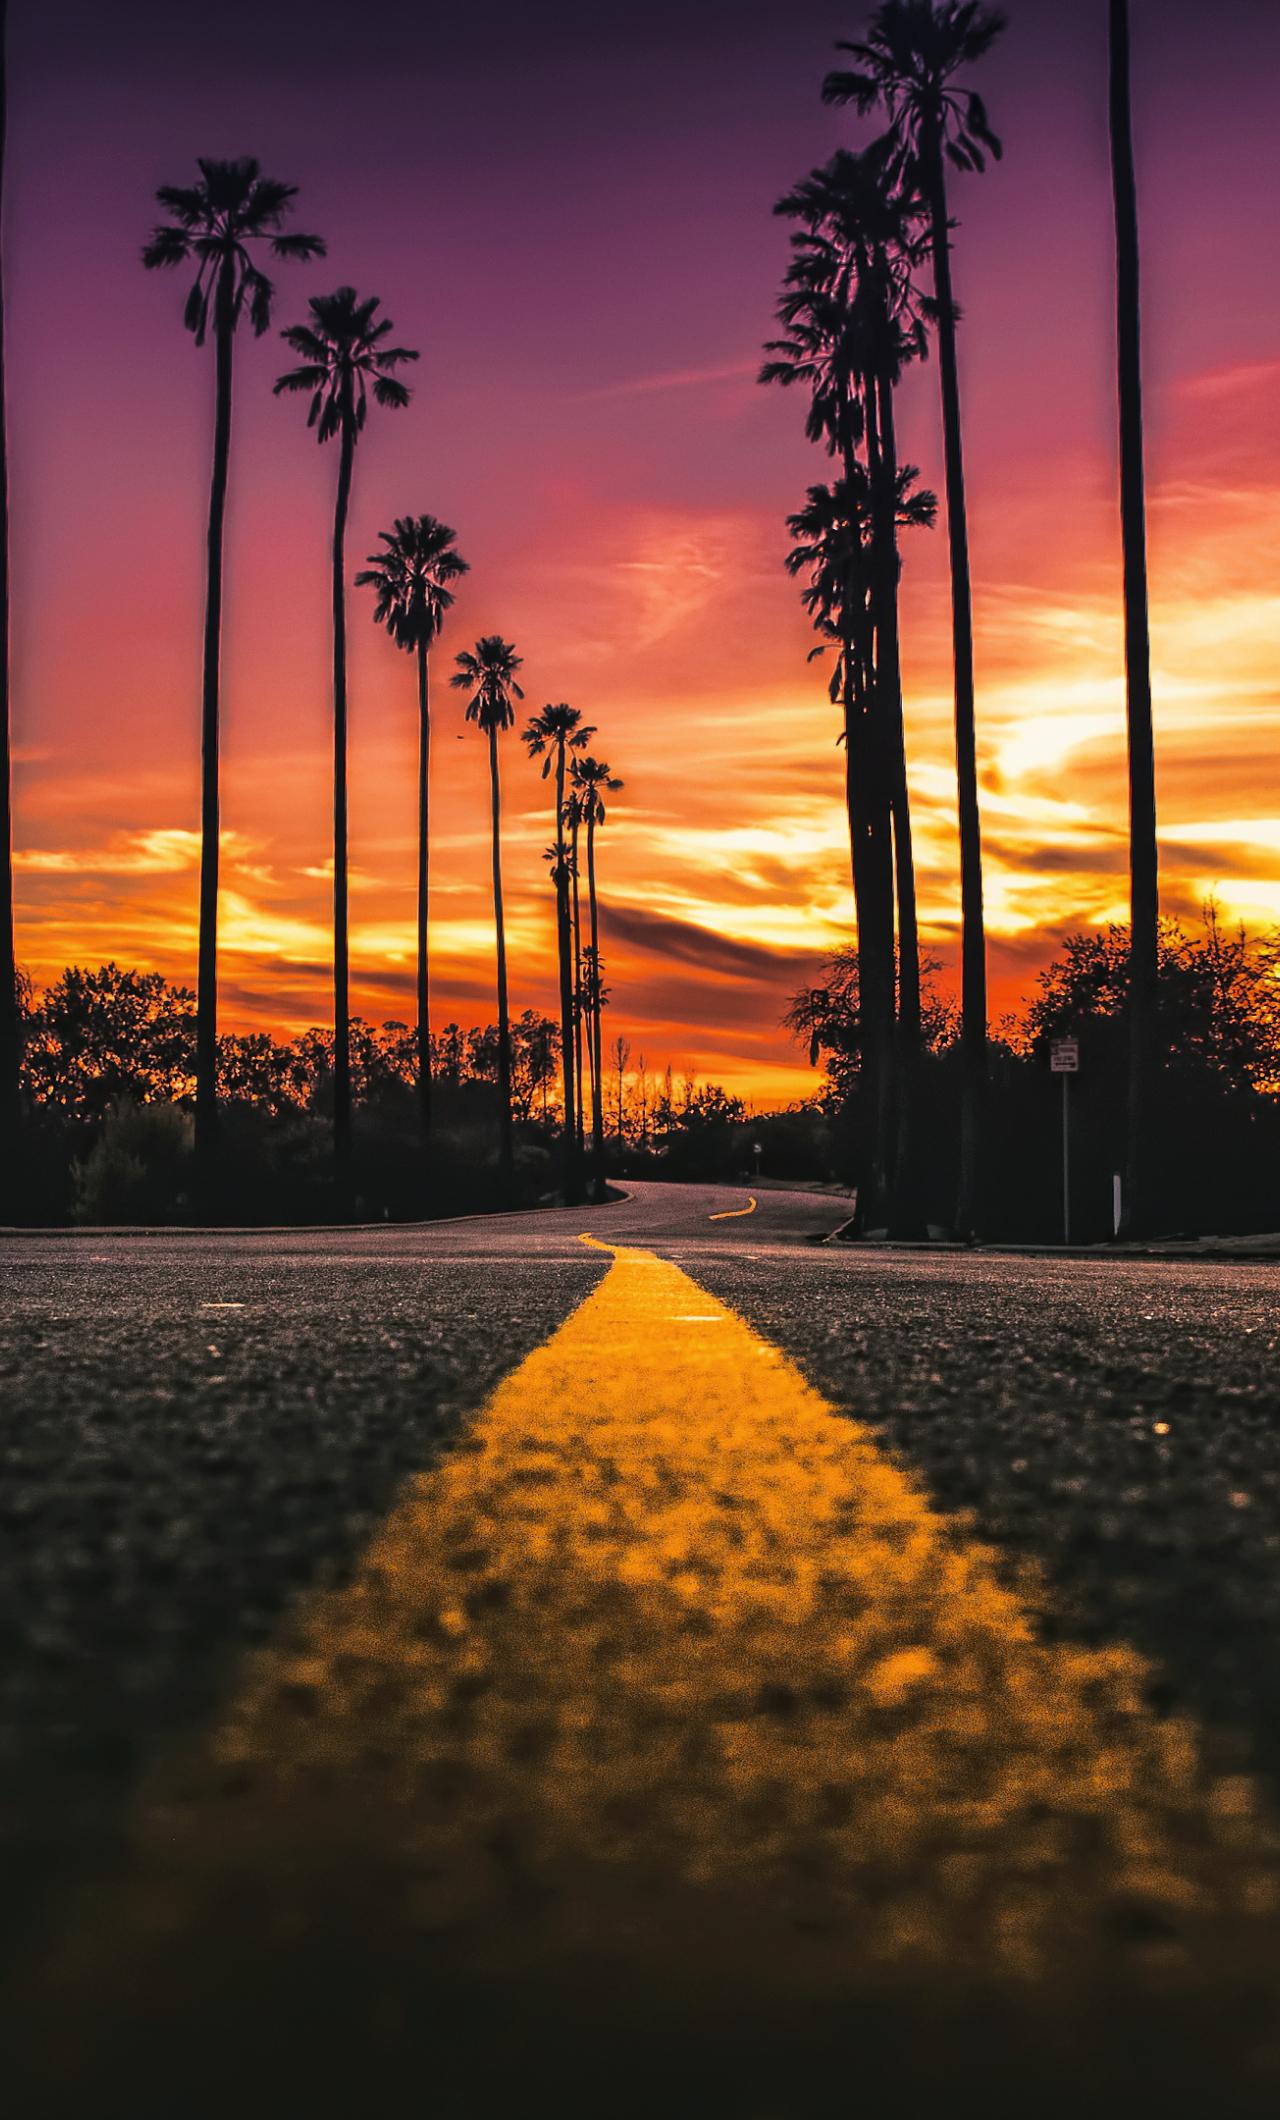 Usa California Road Sunlight Street View, HD 4K Wallpaper